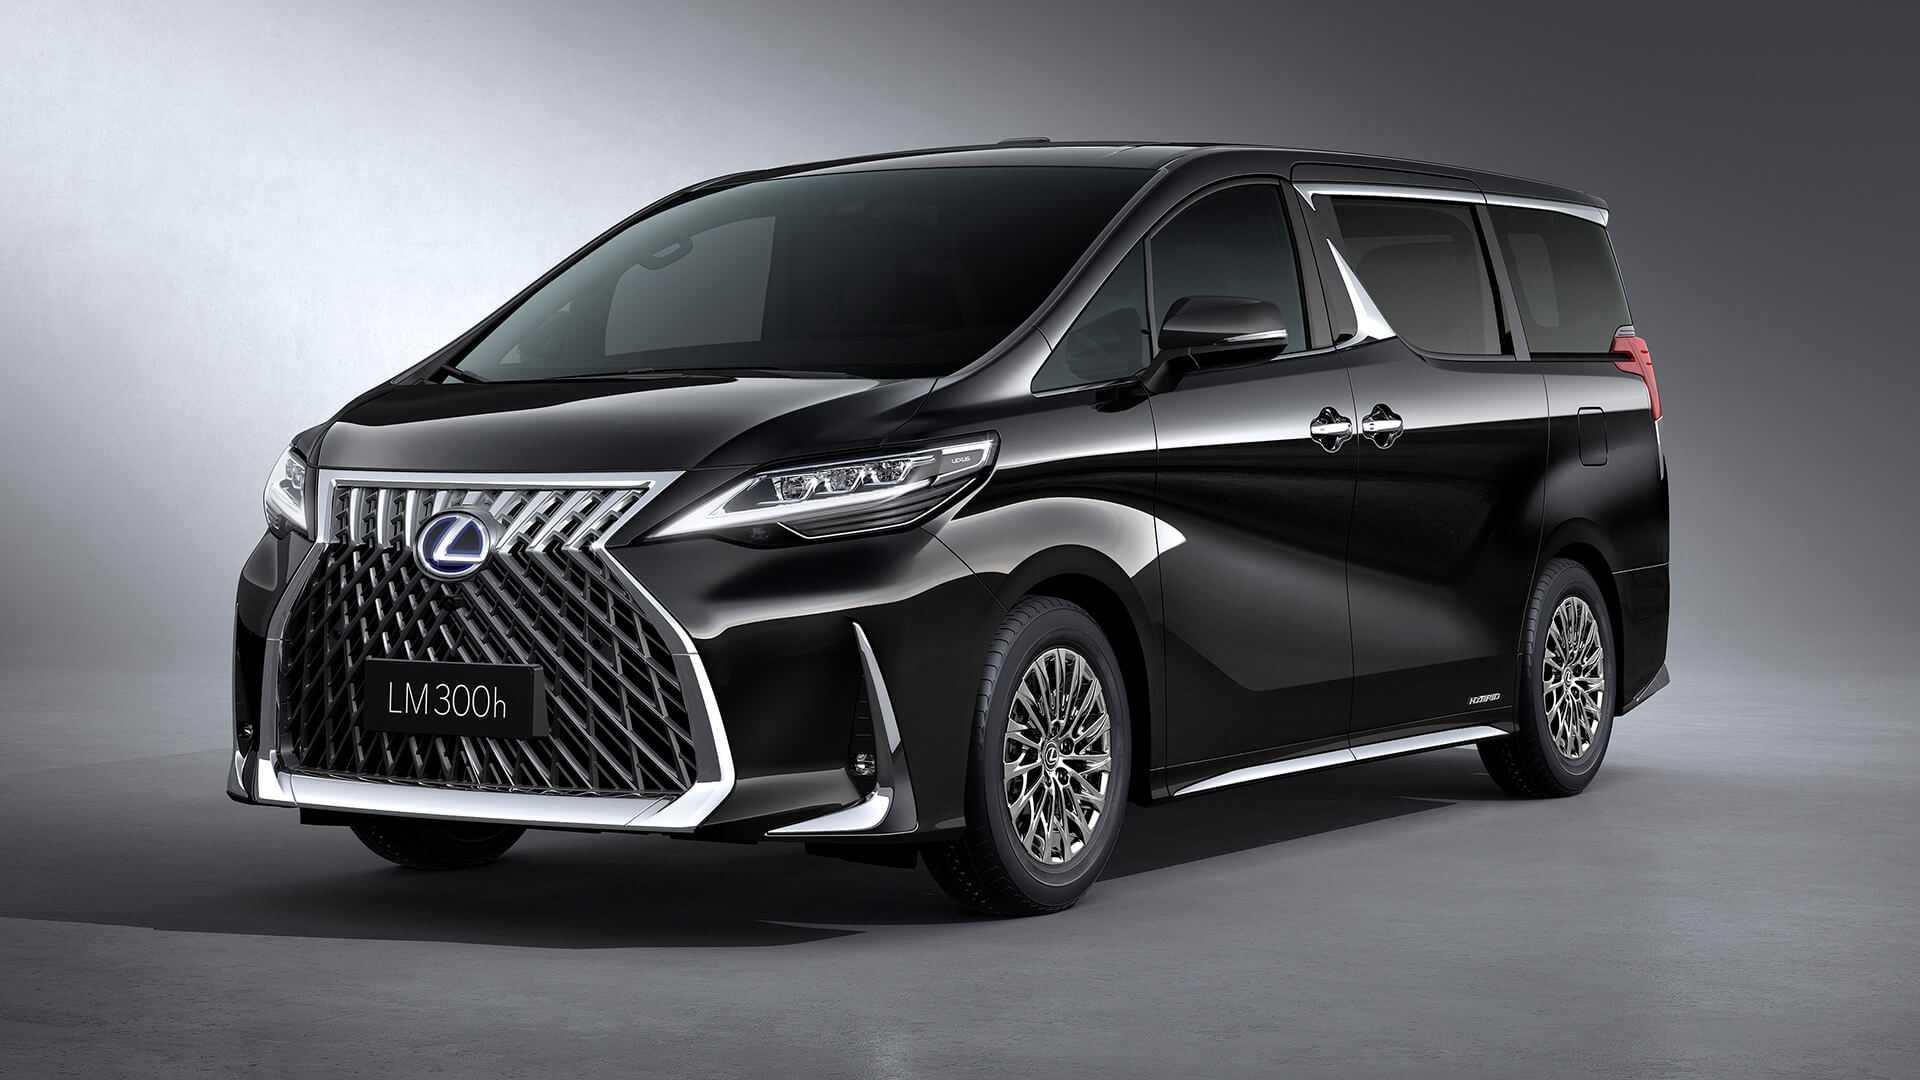 Lexus Lm 300h Luxury Minivan Debuts Looks Amazing